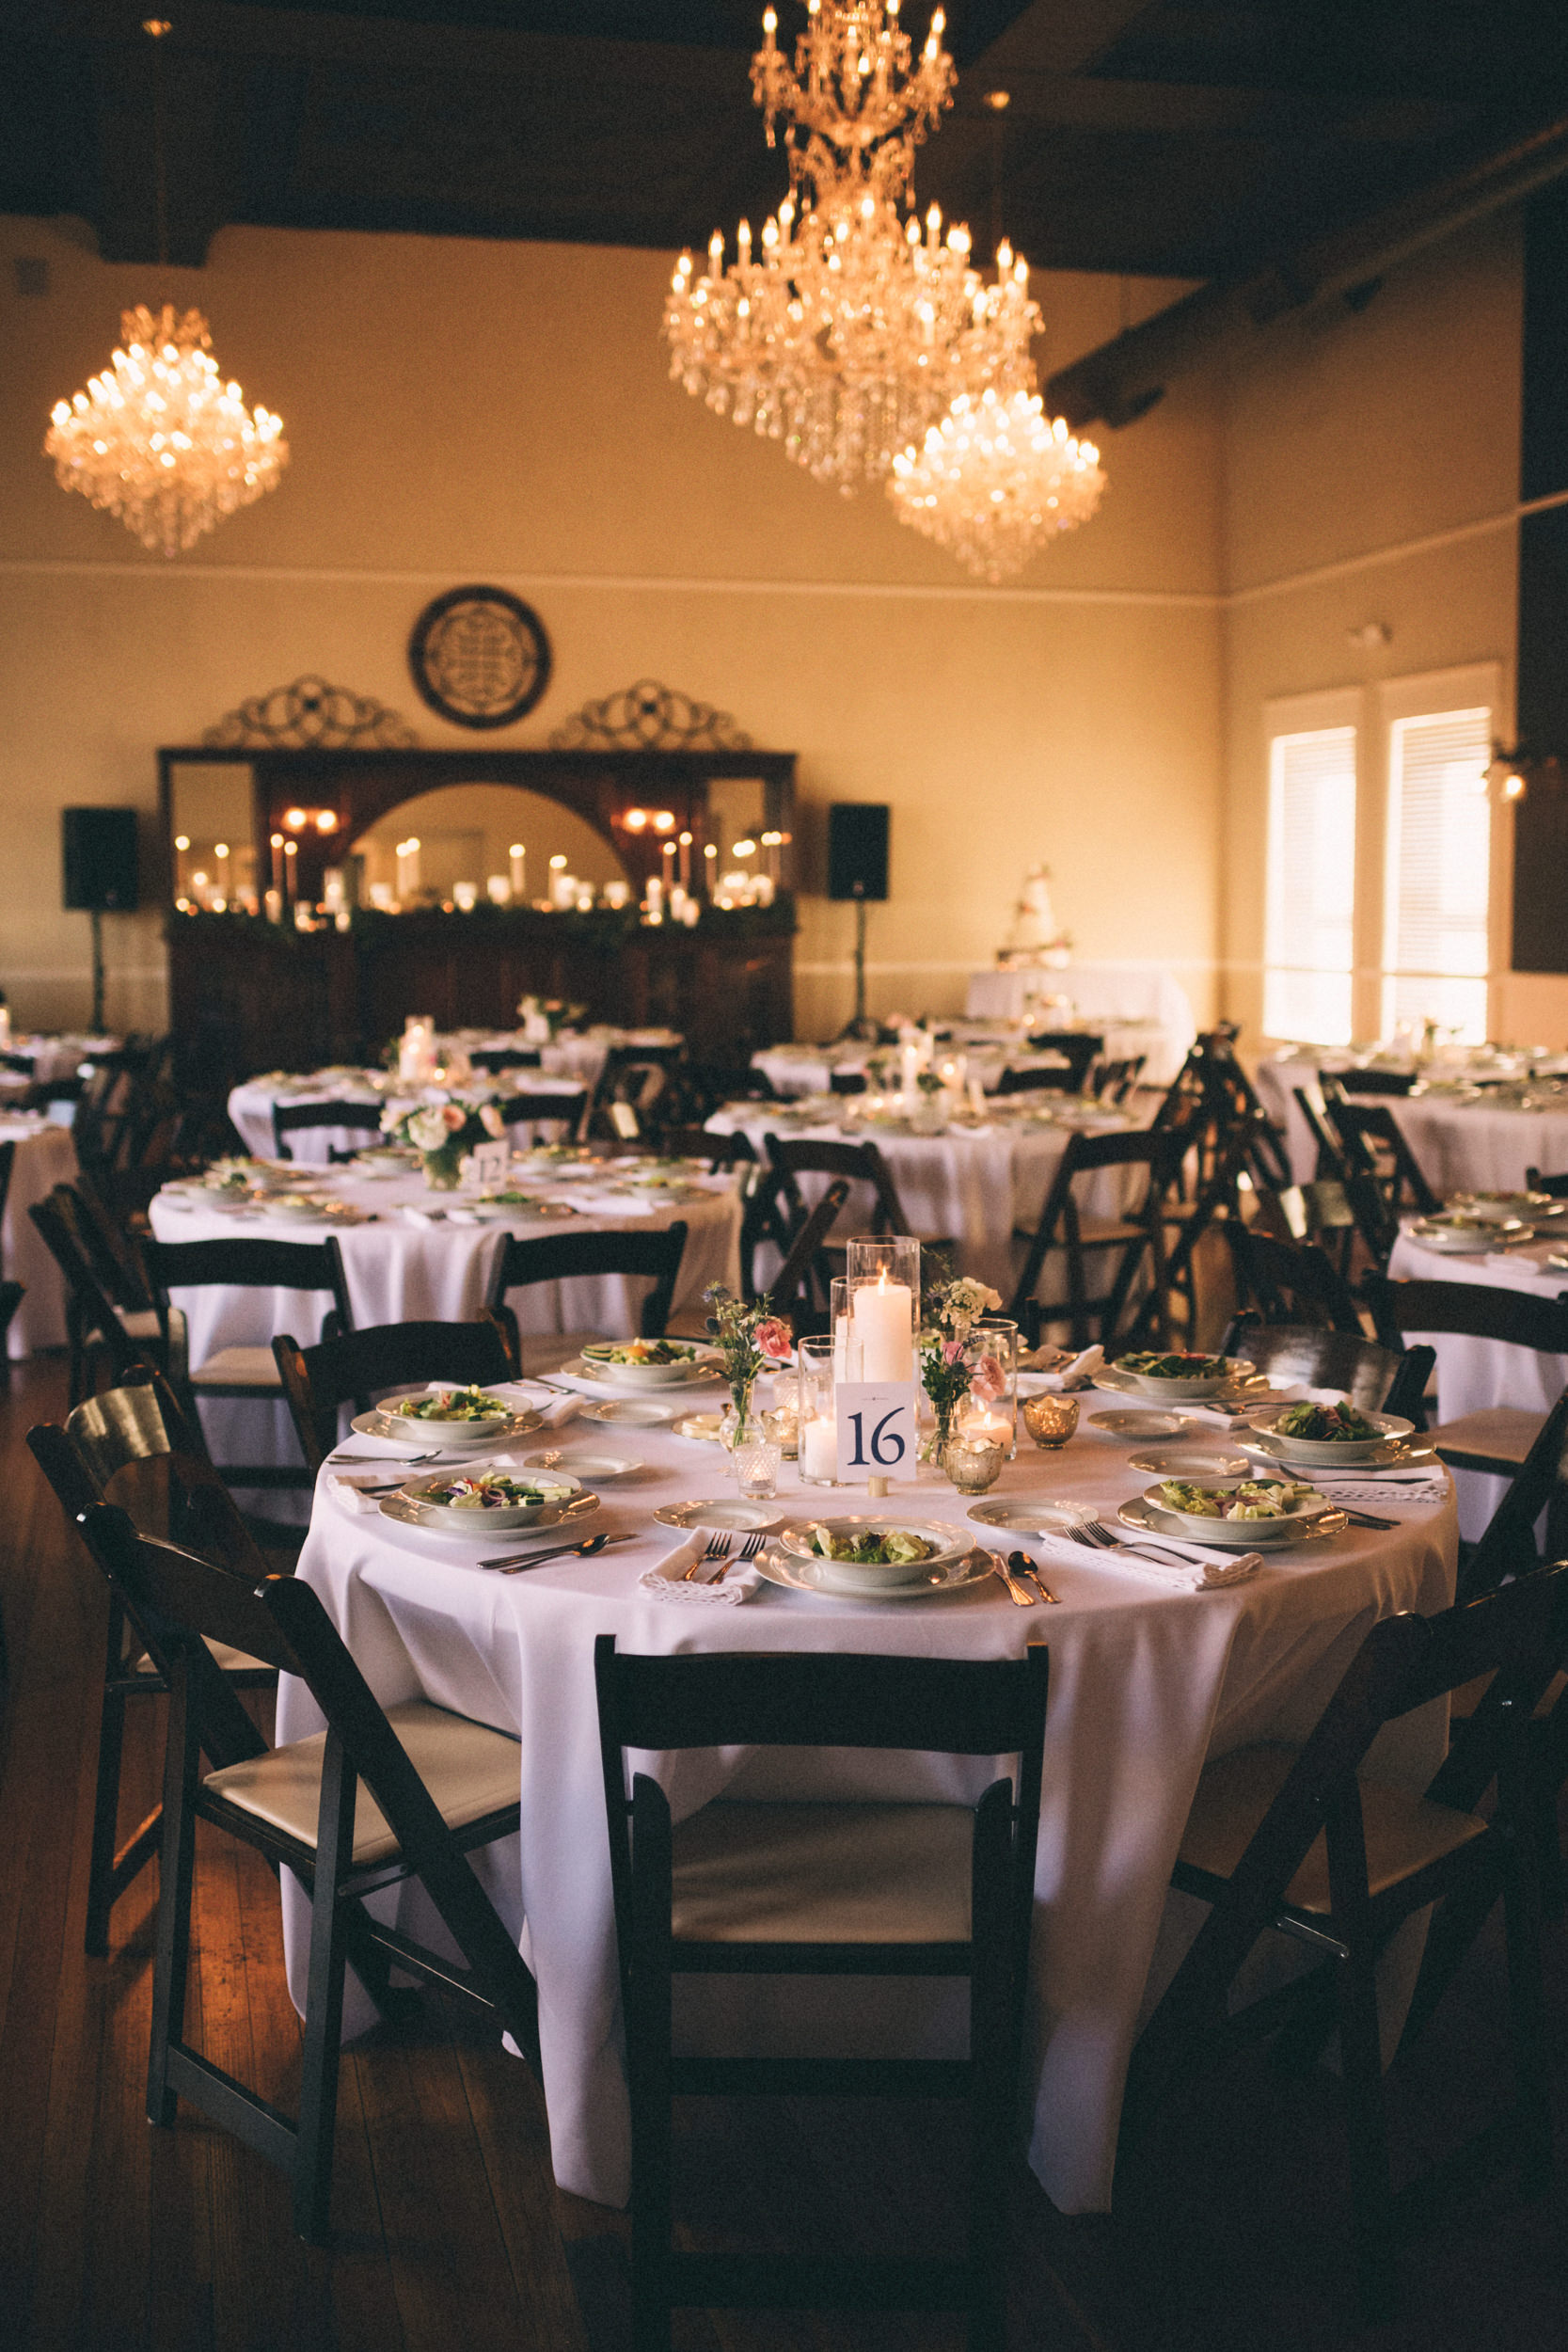 lauren-dean-wedding-grand-lodge-kentucky-sarah-katherine-davis-photography-466edit.jpg